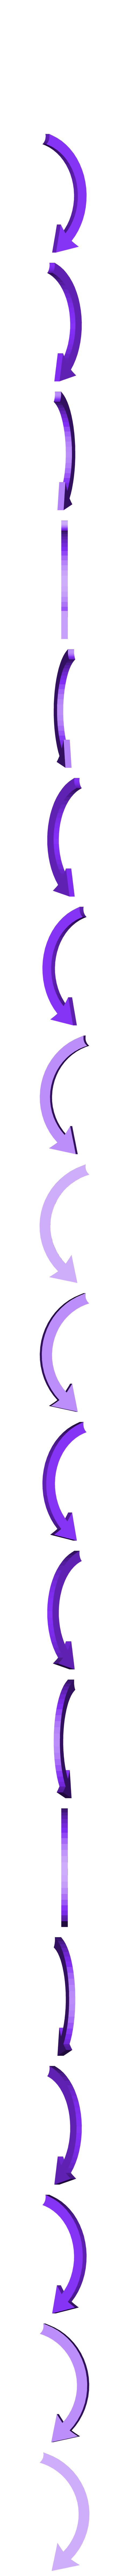 Clockwise Mechanism Arrow.stl Download STL file Clockwise Mechanism • 3D printer model, Chrisibub